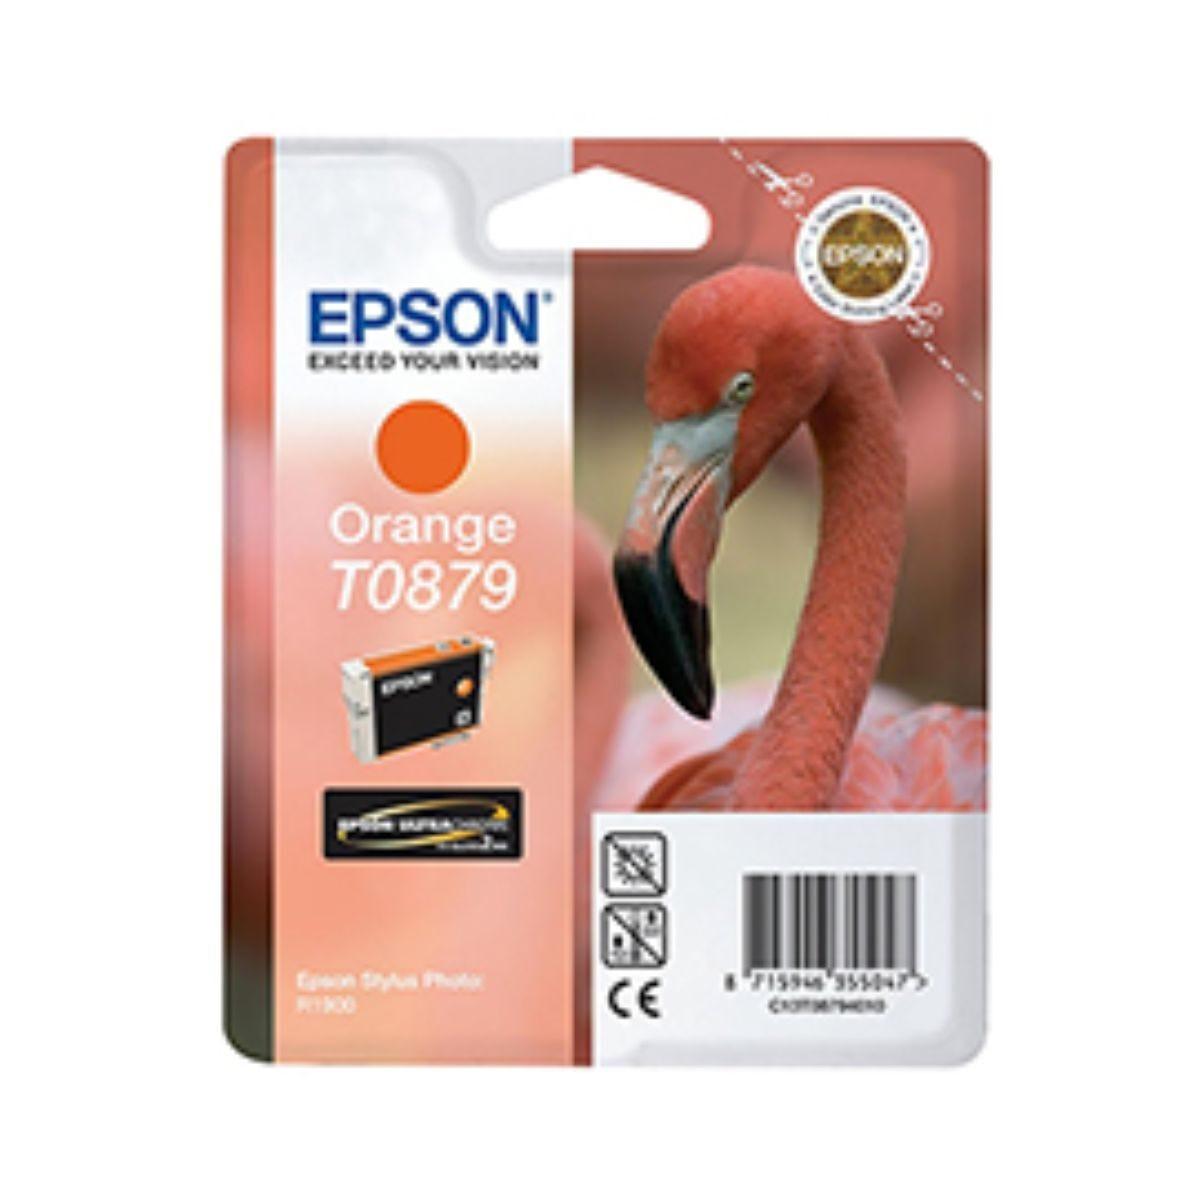 Epson T0879 Orange Ink Cartridge